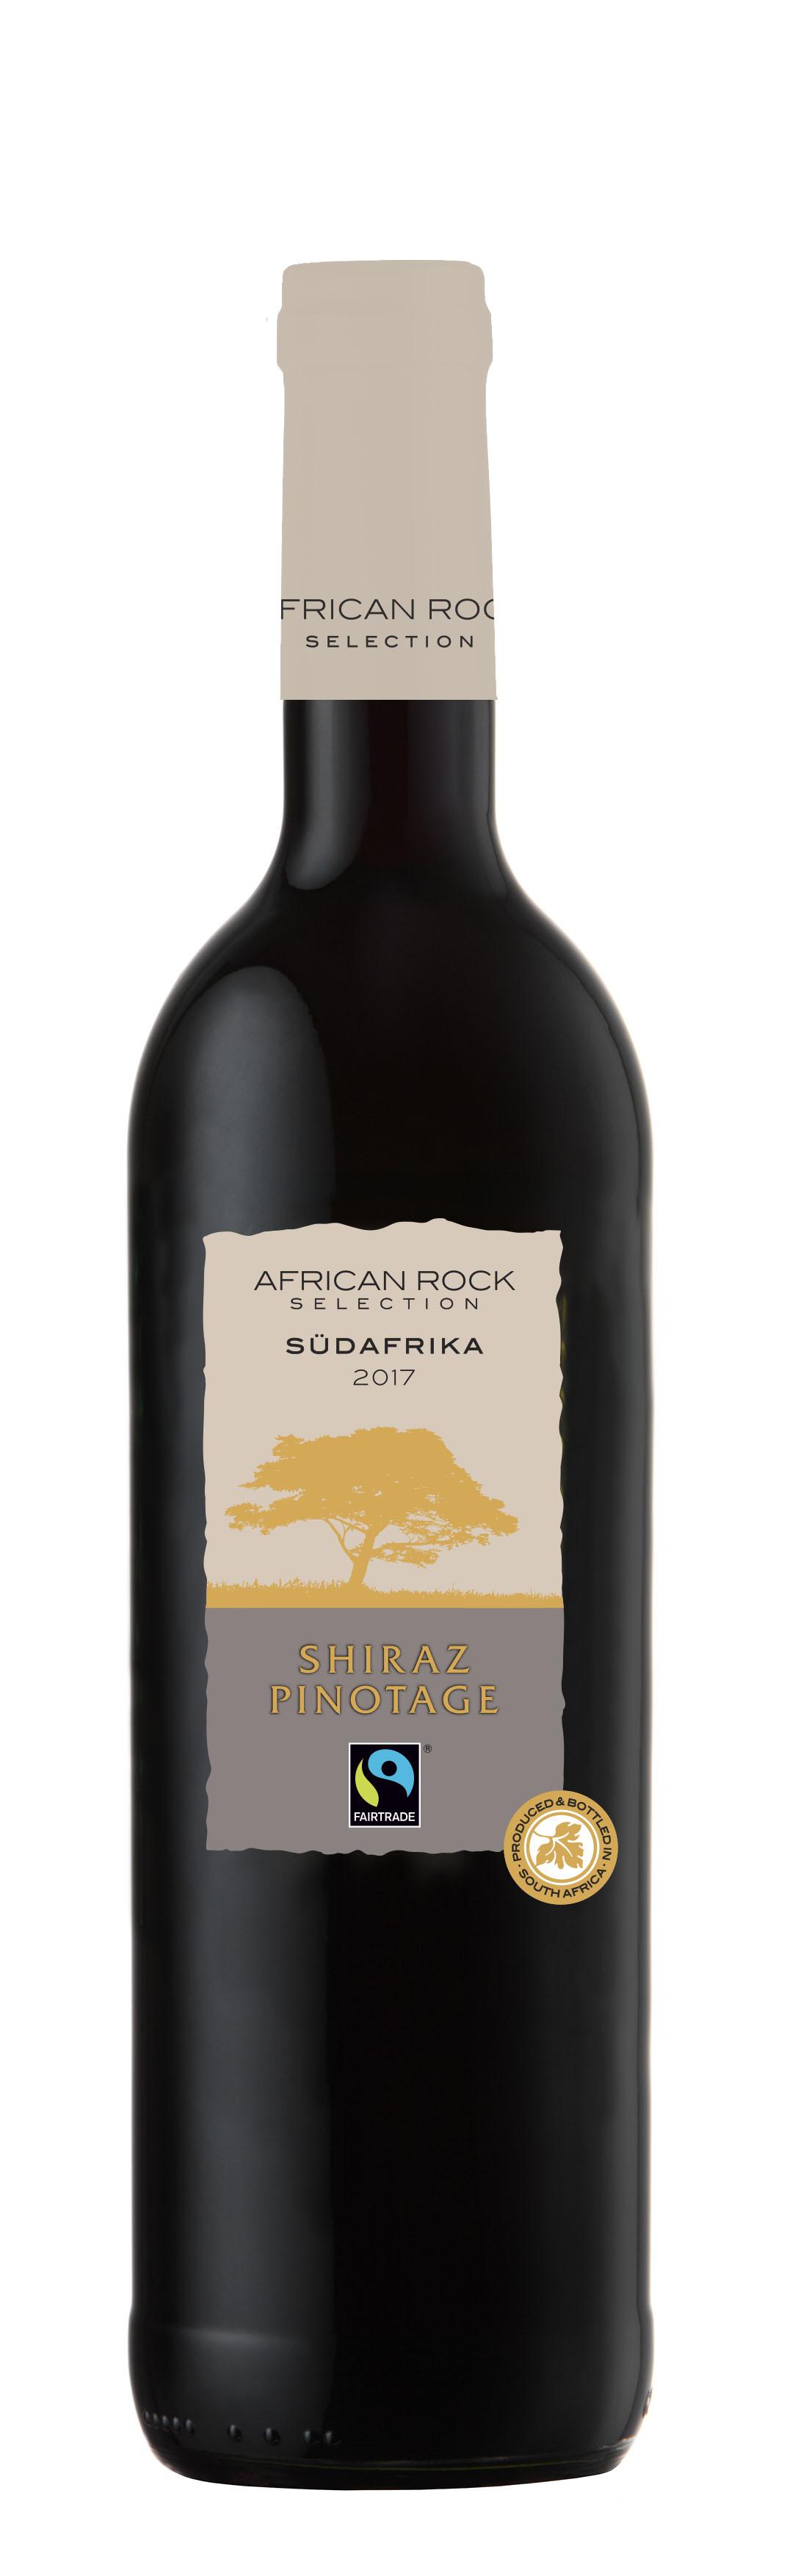 African Rock Selection Sudafrika